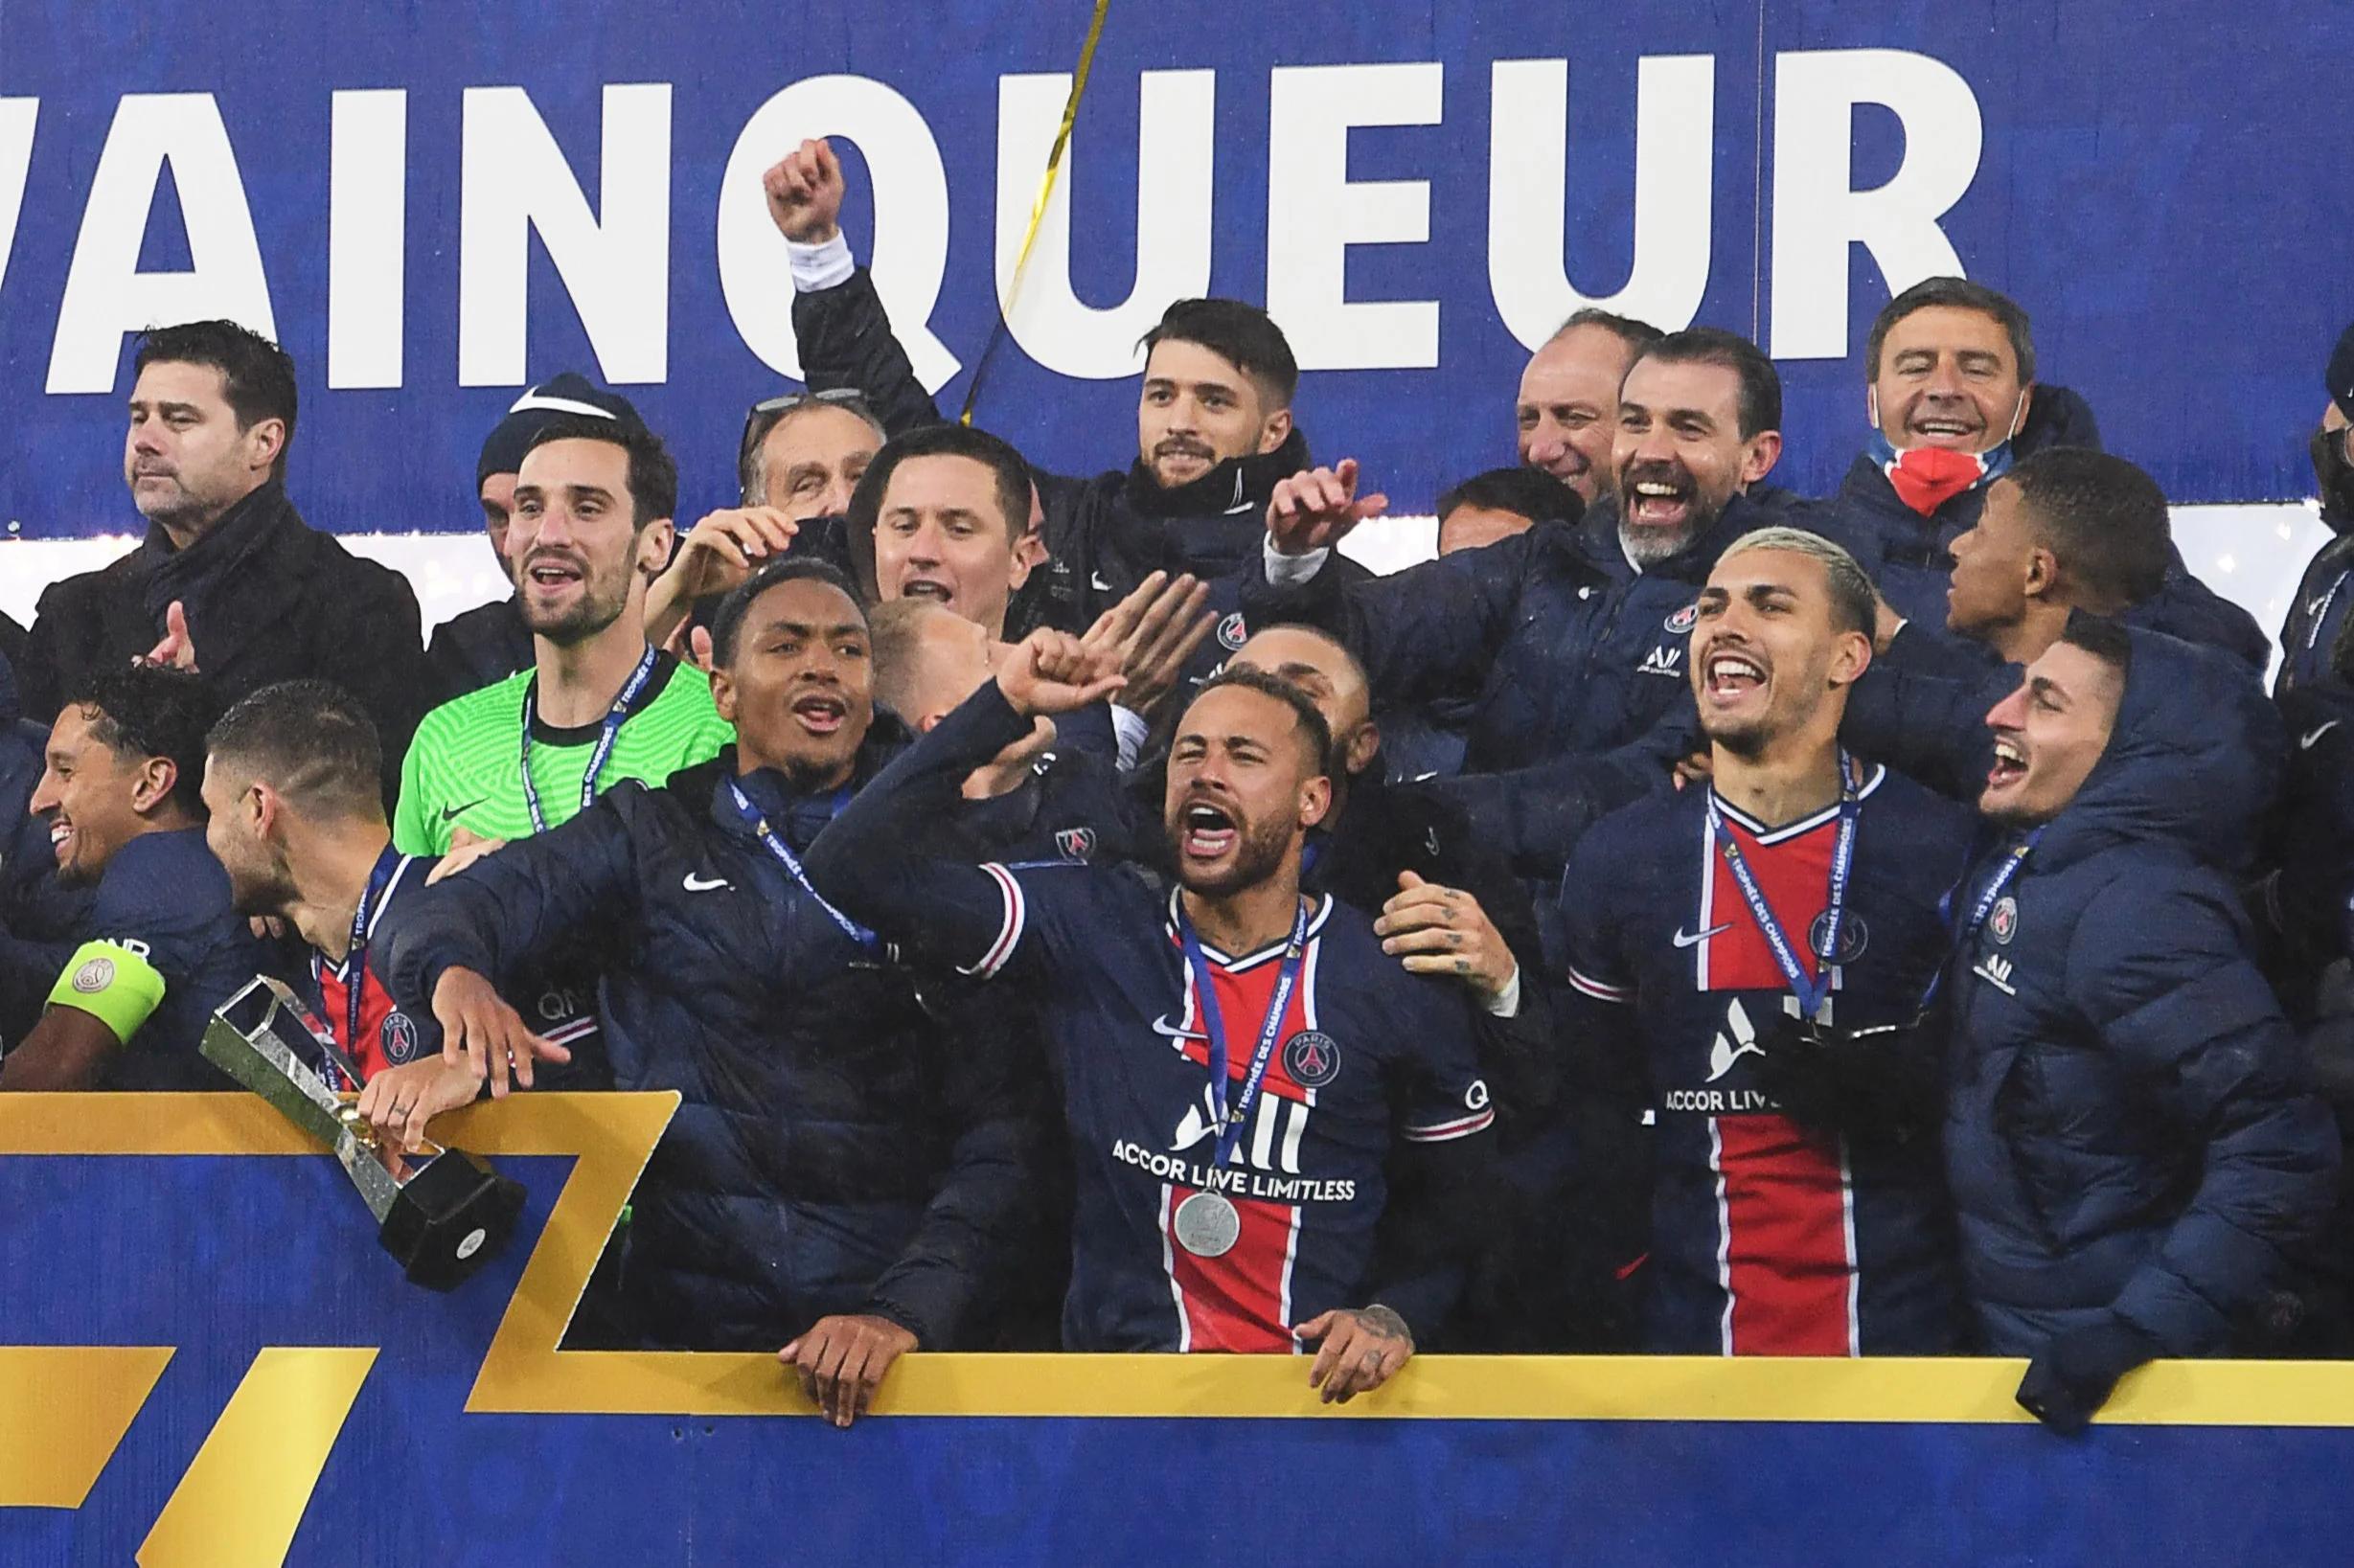 mauricio pochettino wins first trophy